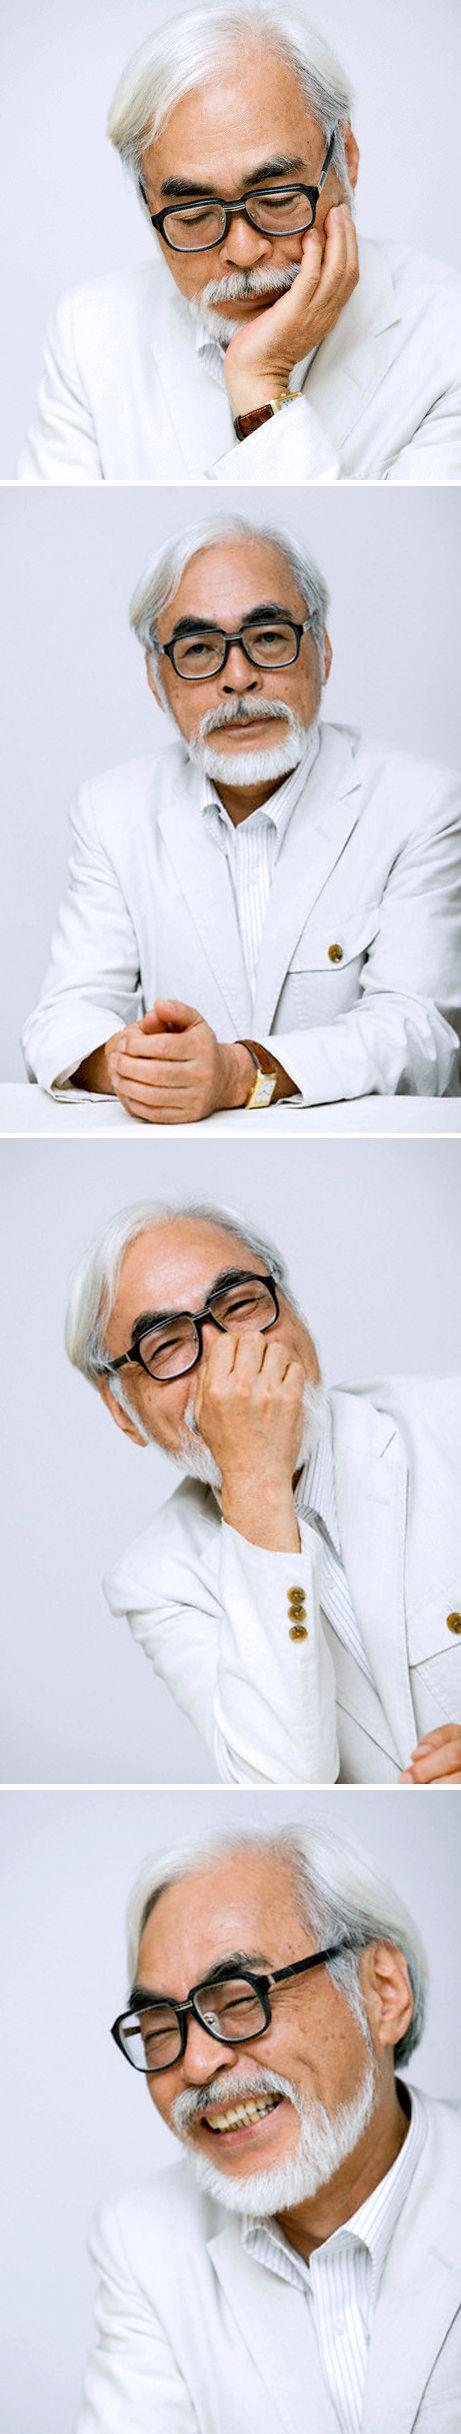 Hayao Miyazaki Japanese film director, producer, screenwriter, animator, author, and manga artist.